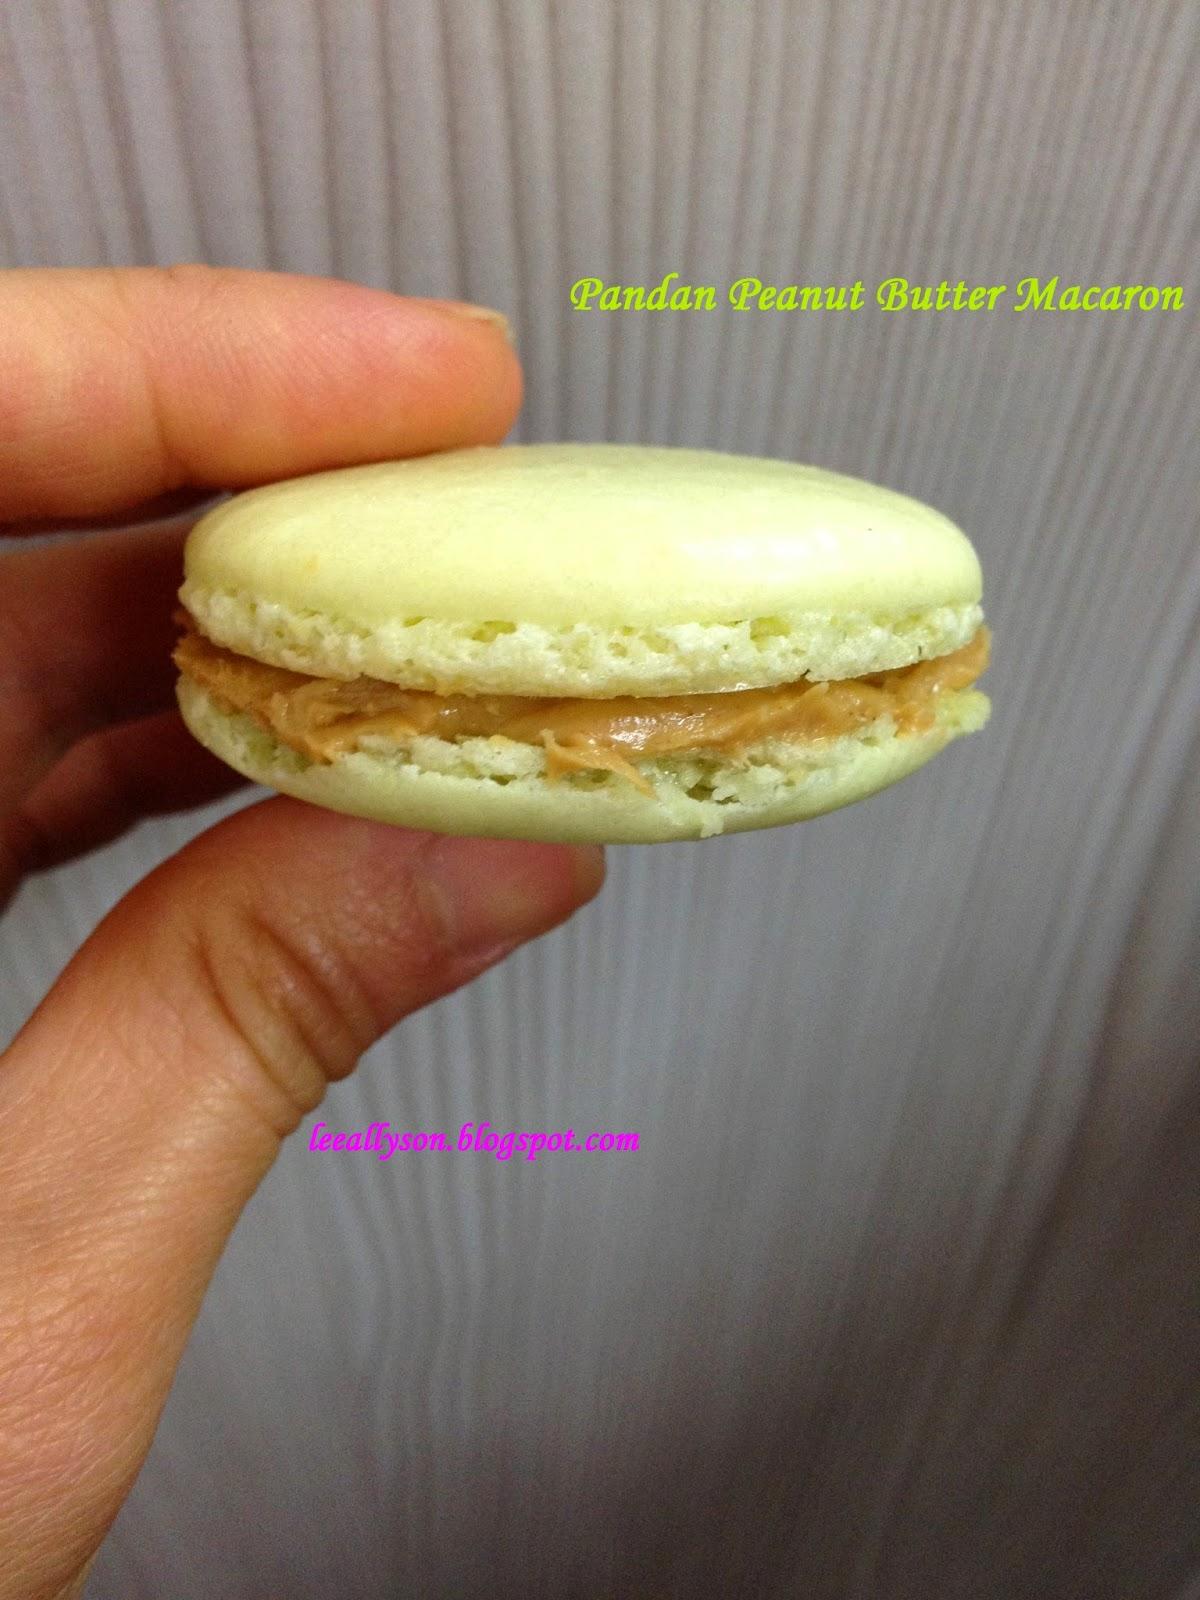 Pandan Peanut Butter Macarons